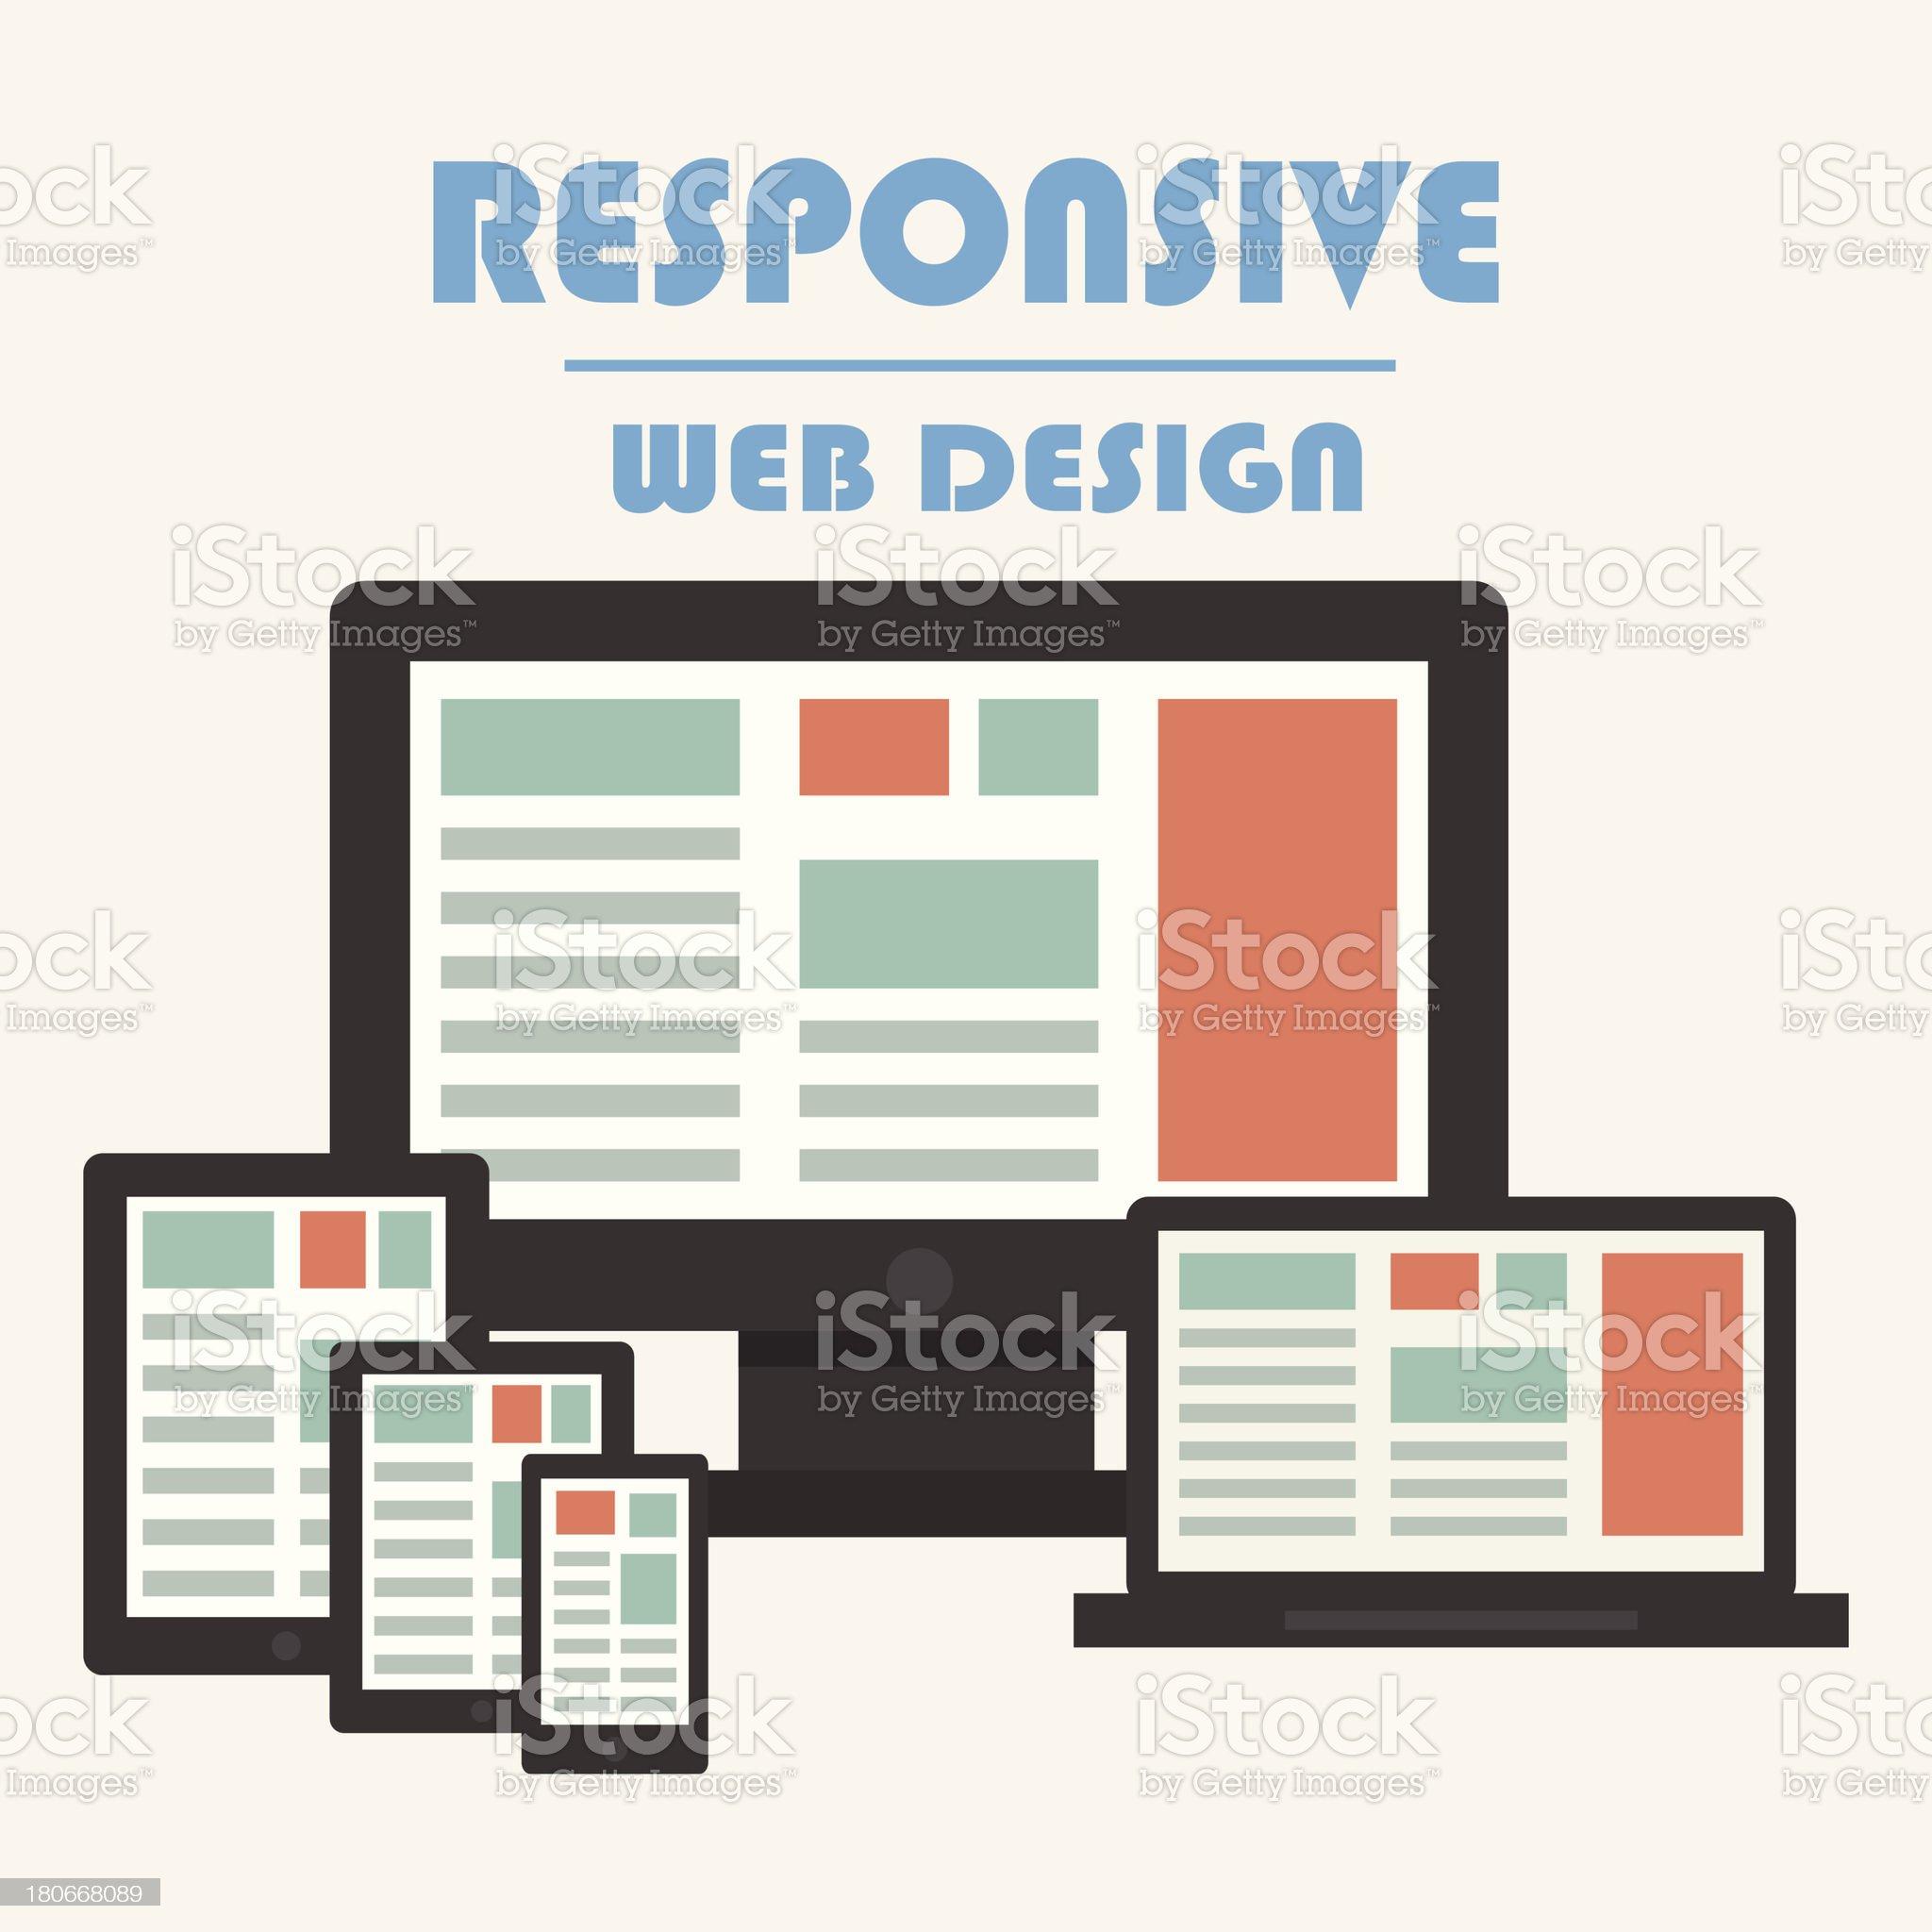 Responsive Web Design royalty-free stock vector art